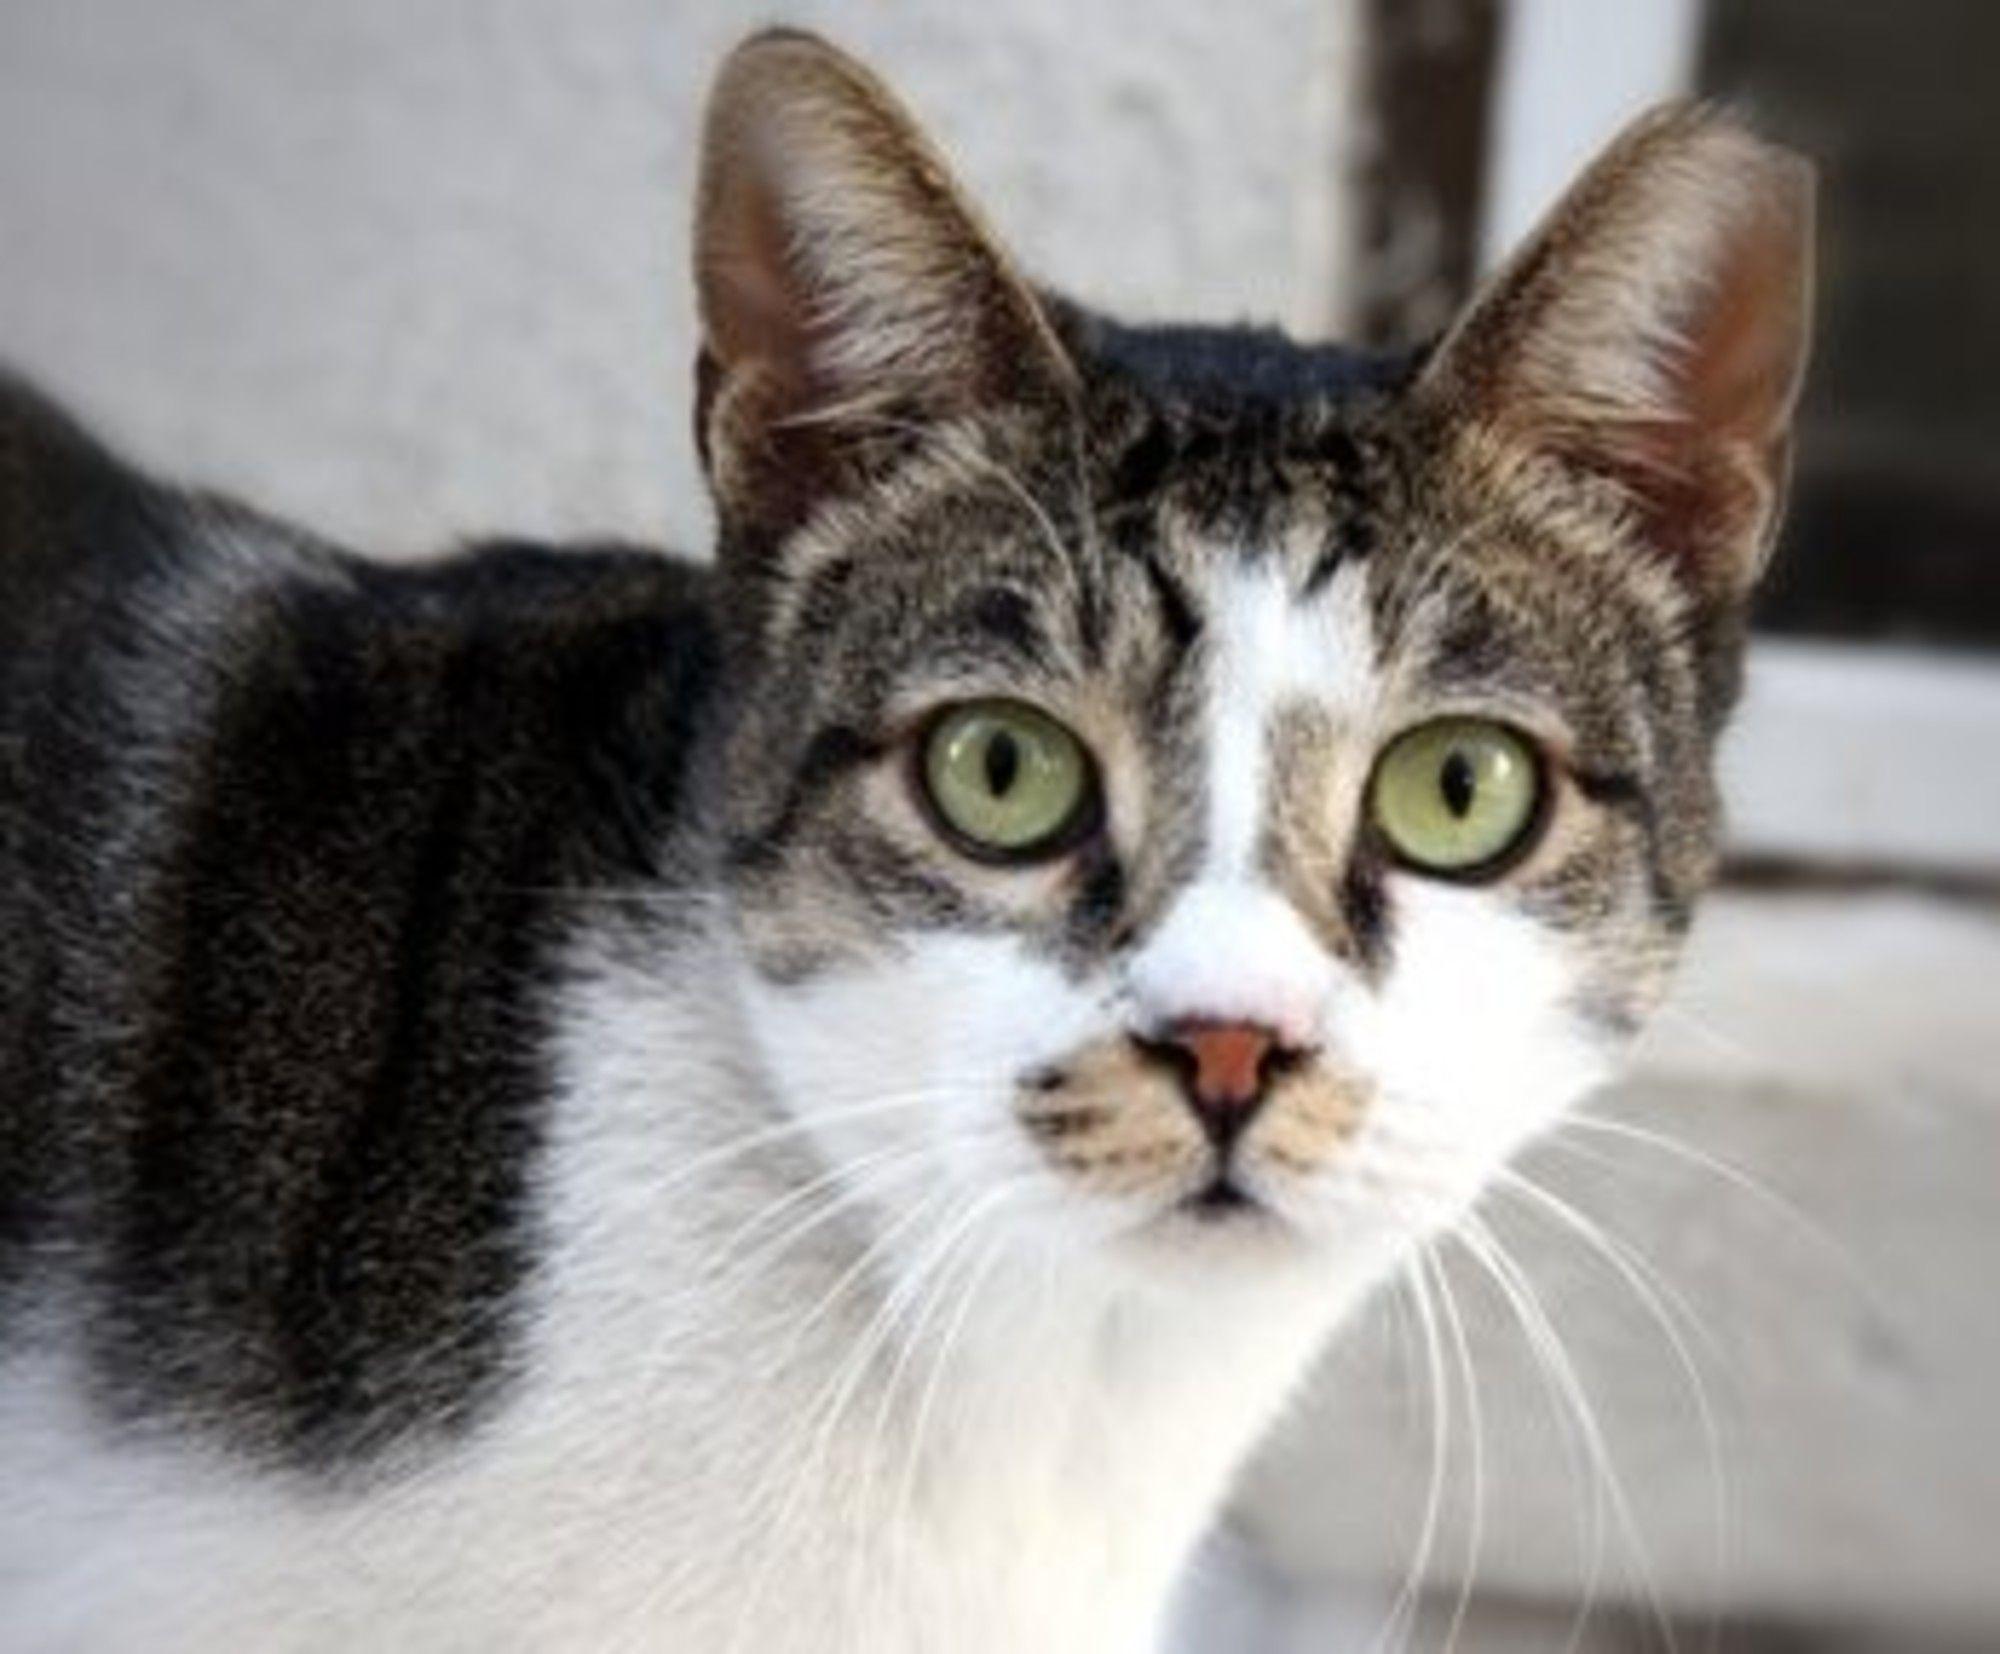 Vomiting in Cats Cats, Cat urine, Cat throwing up